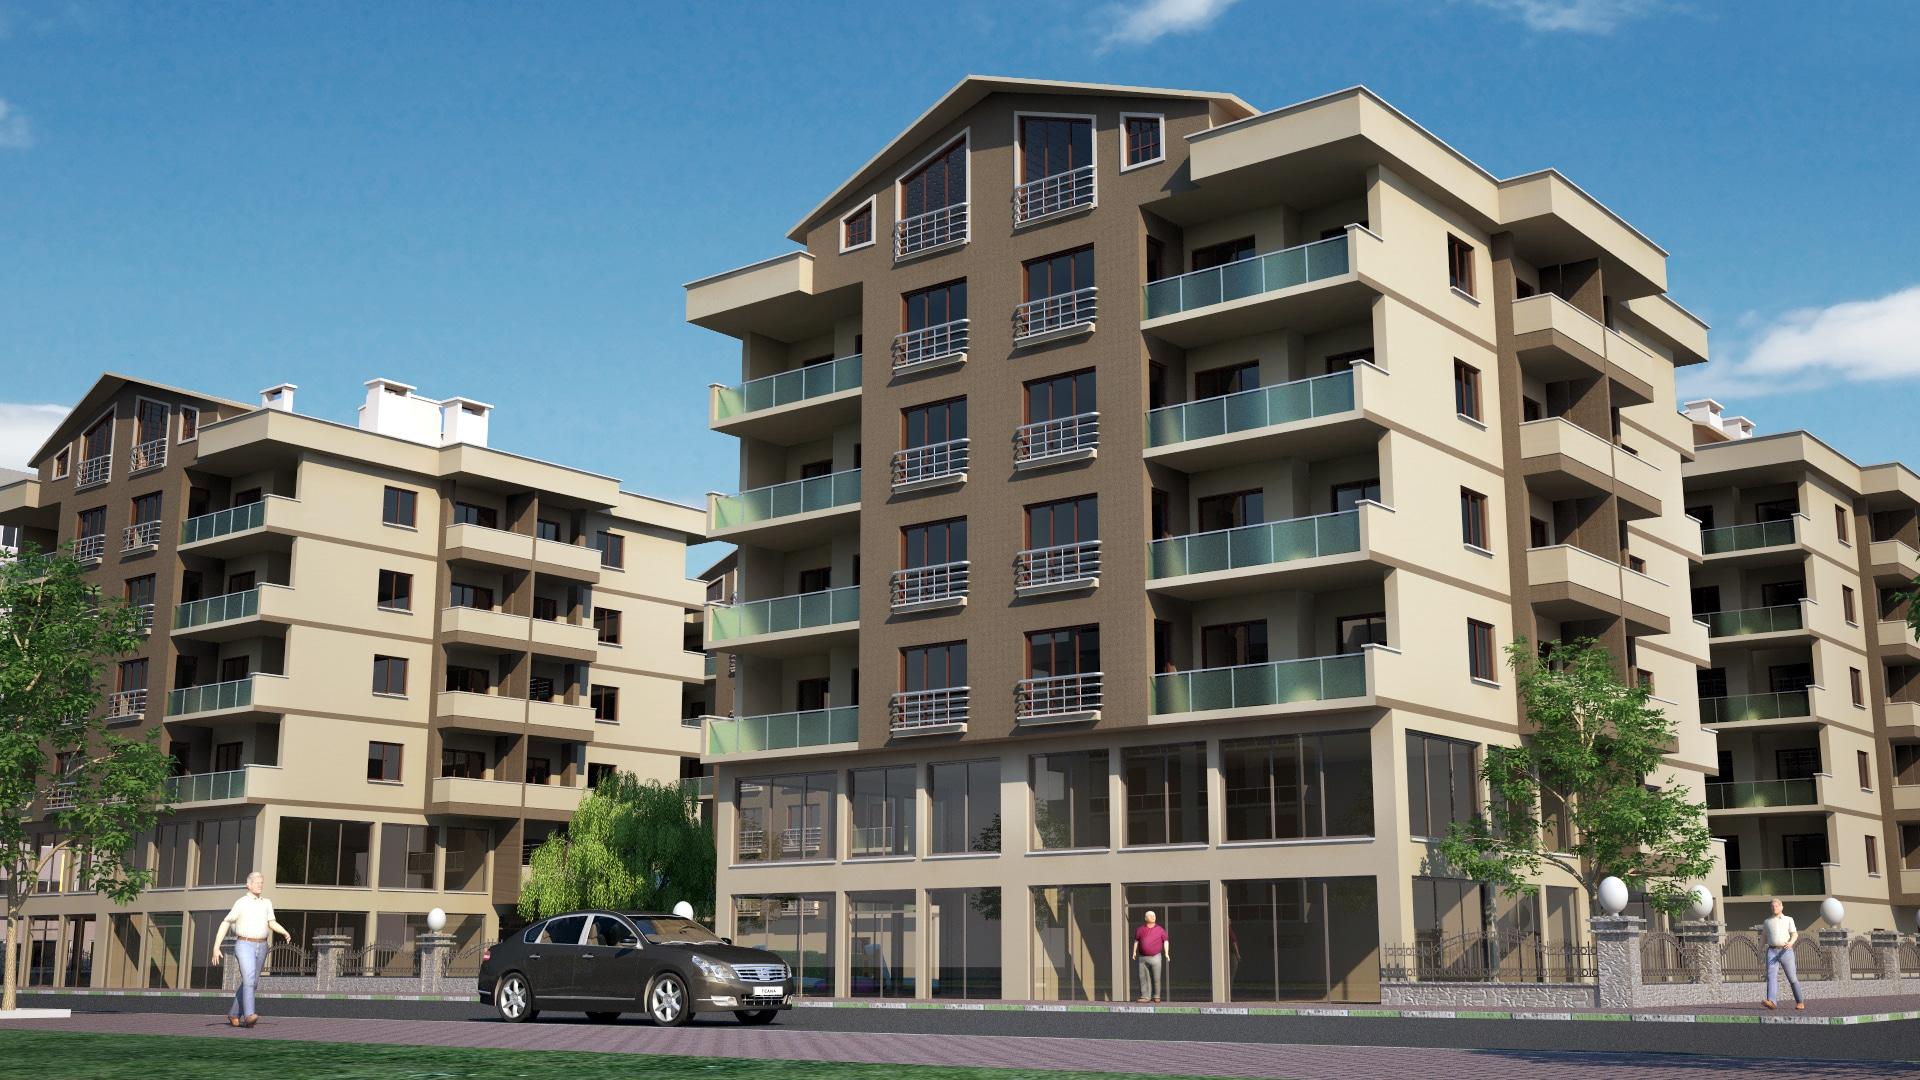 Tasyakan Yunusevler Housing Project